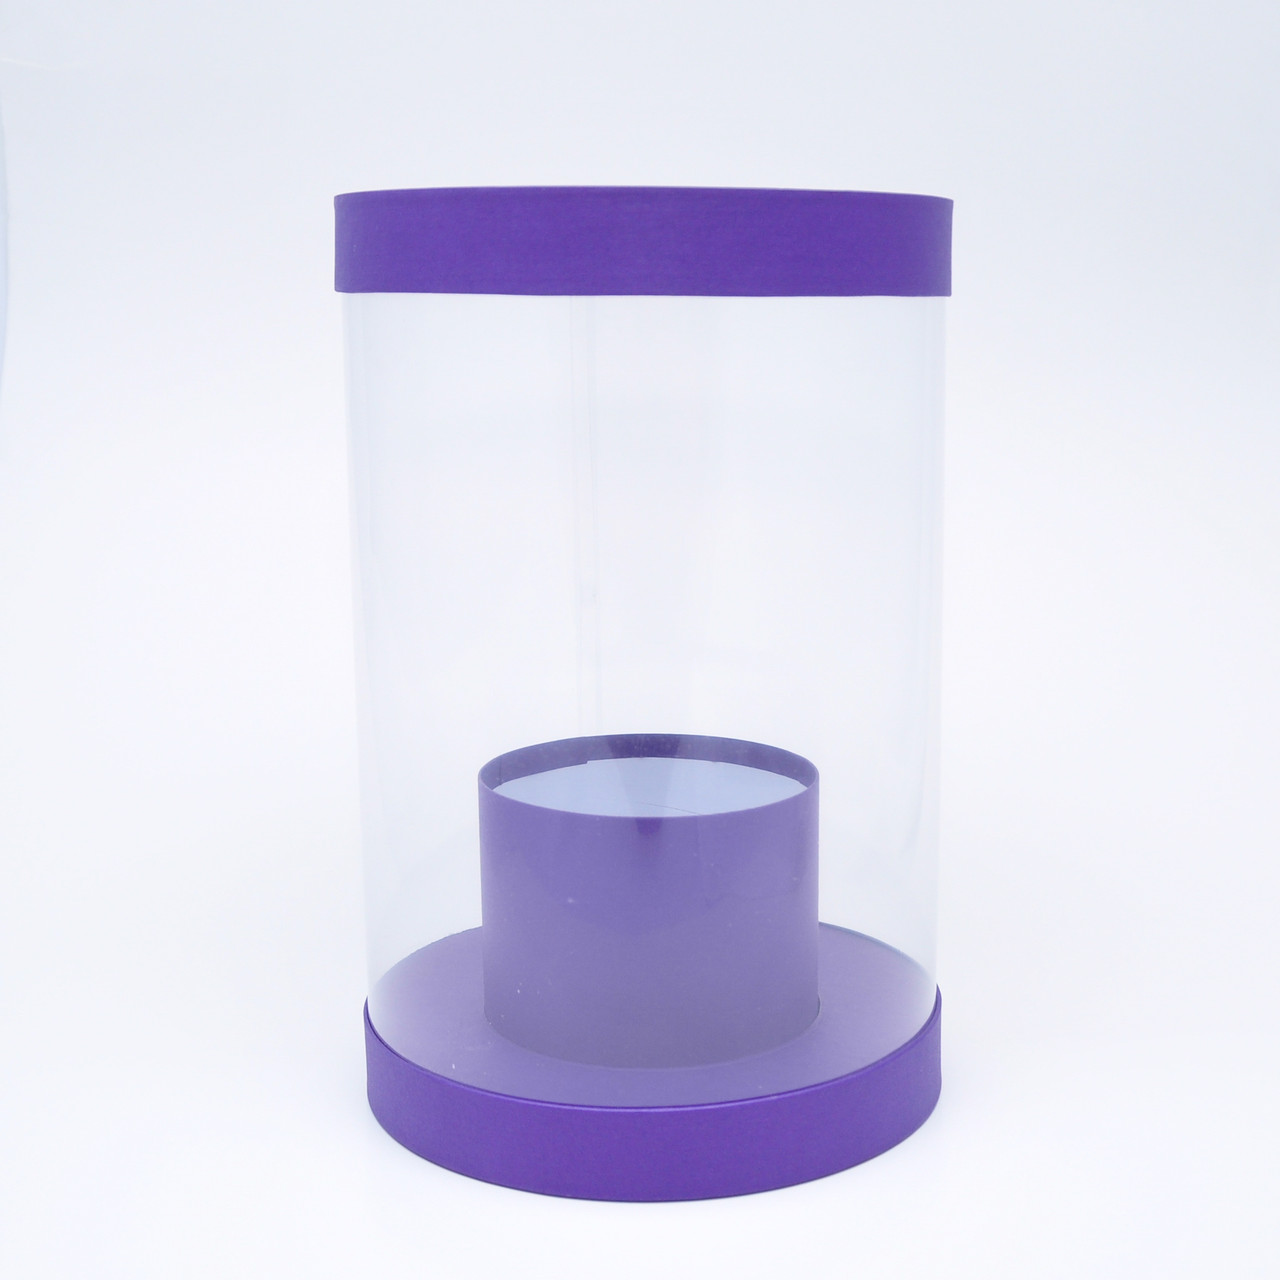 Круглая коробка из прозрачного пластика